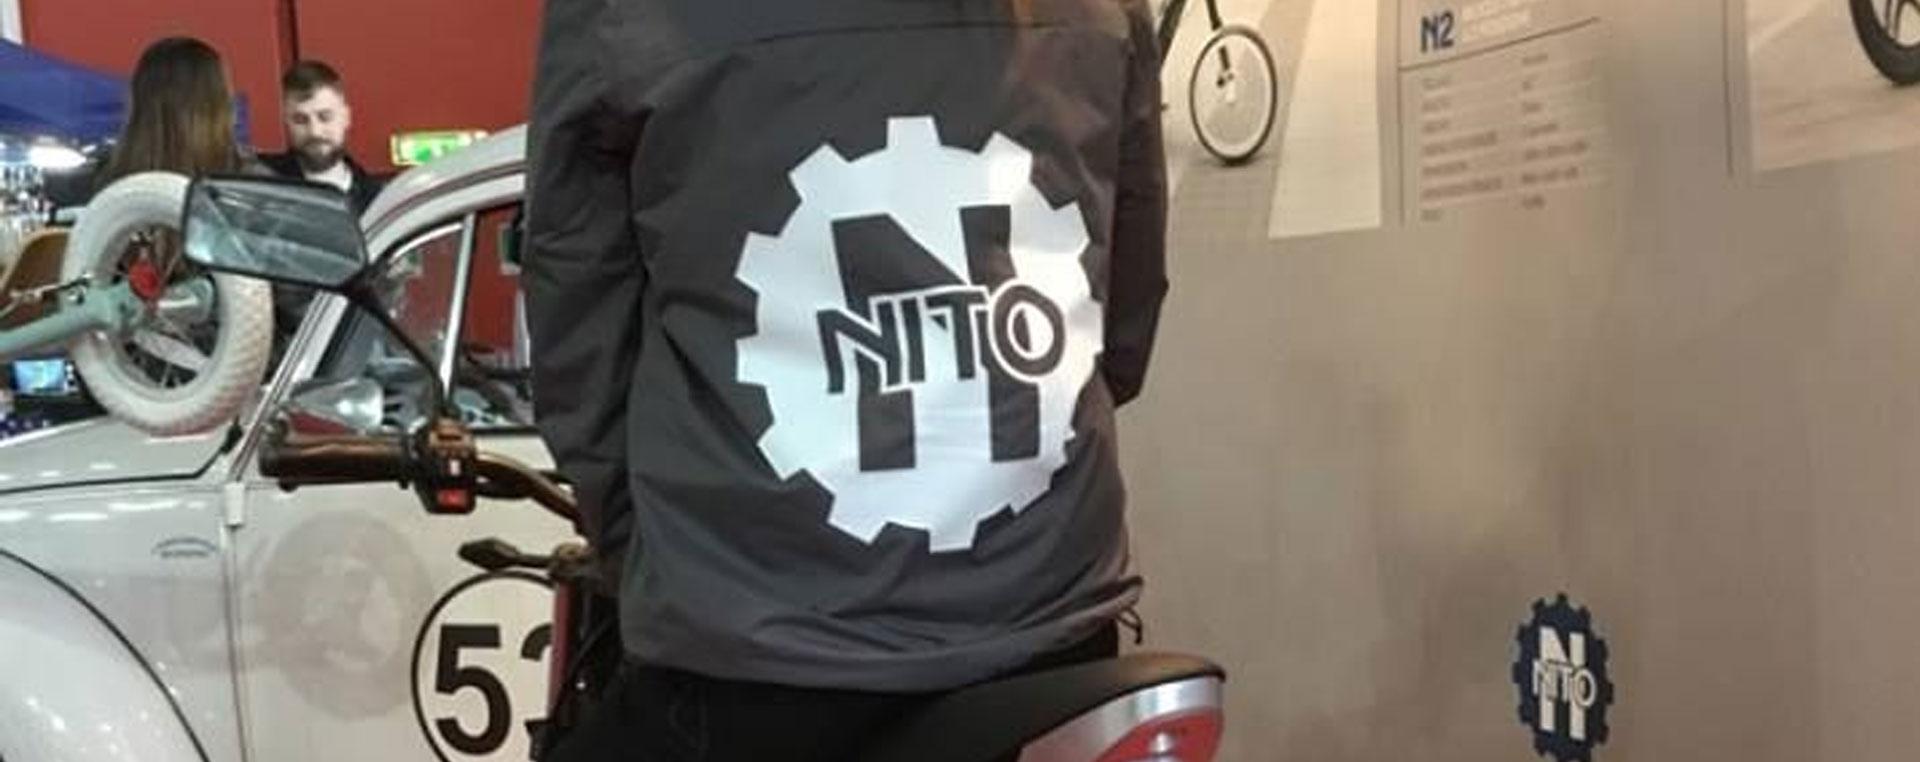 nito-automotoretro1